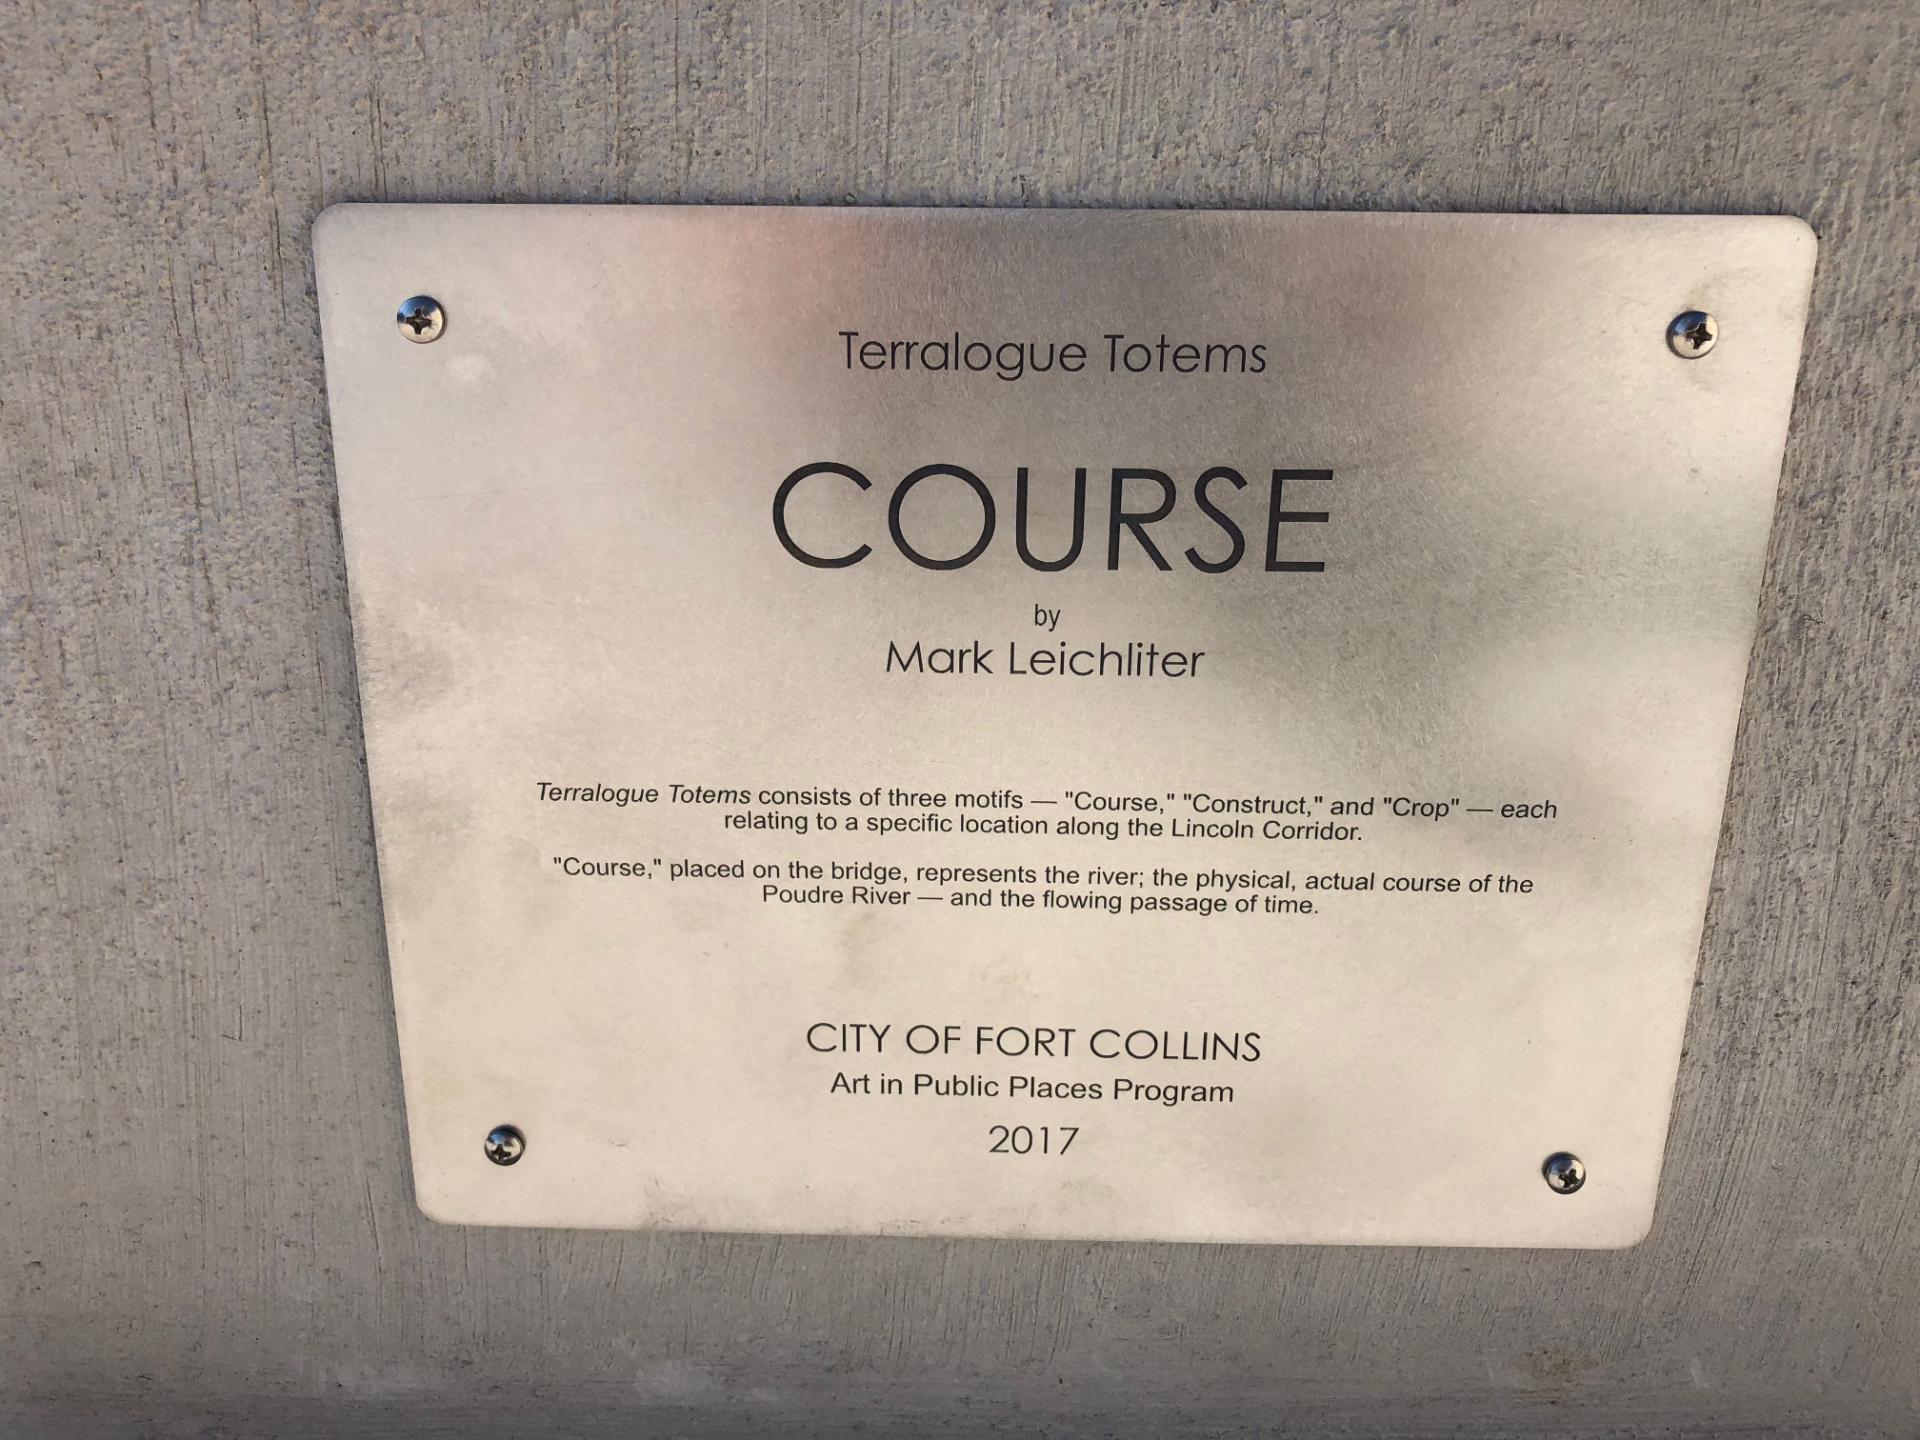 Terralogue Totems